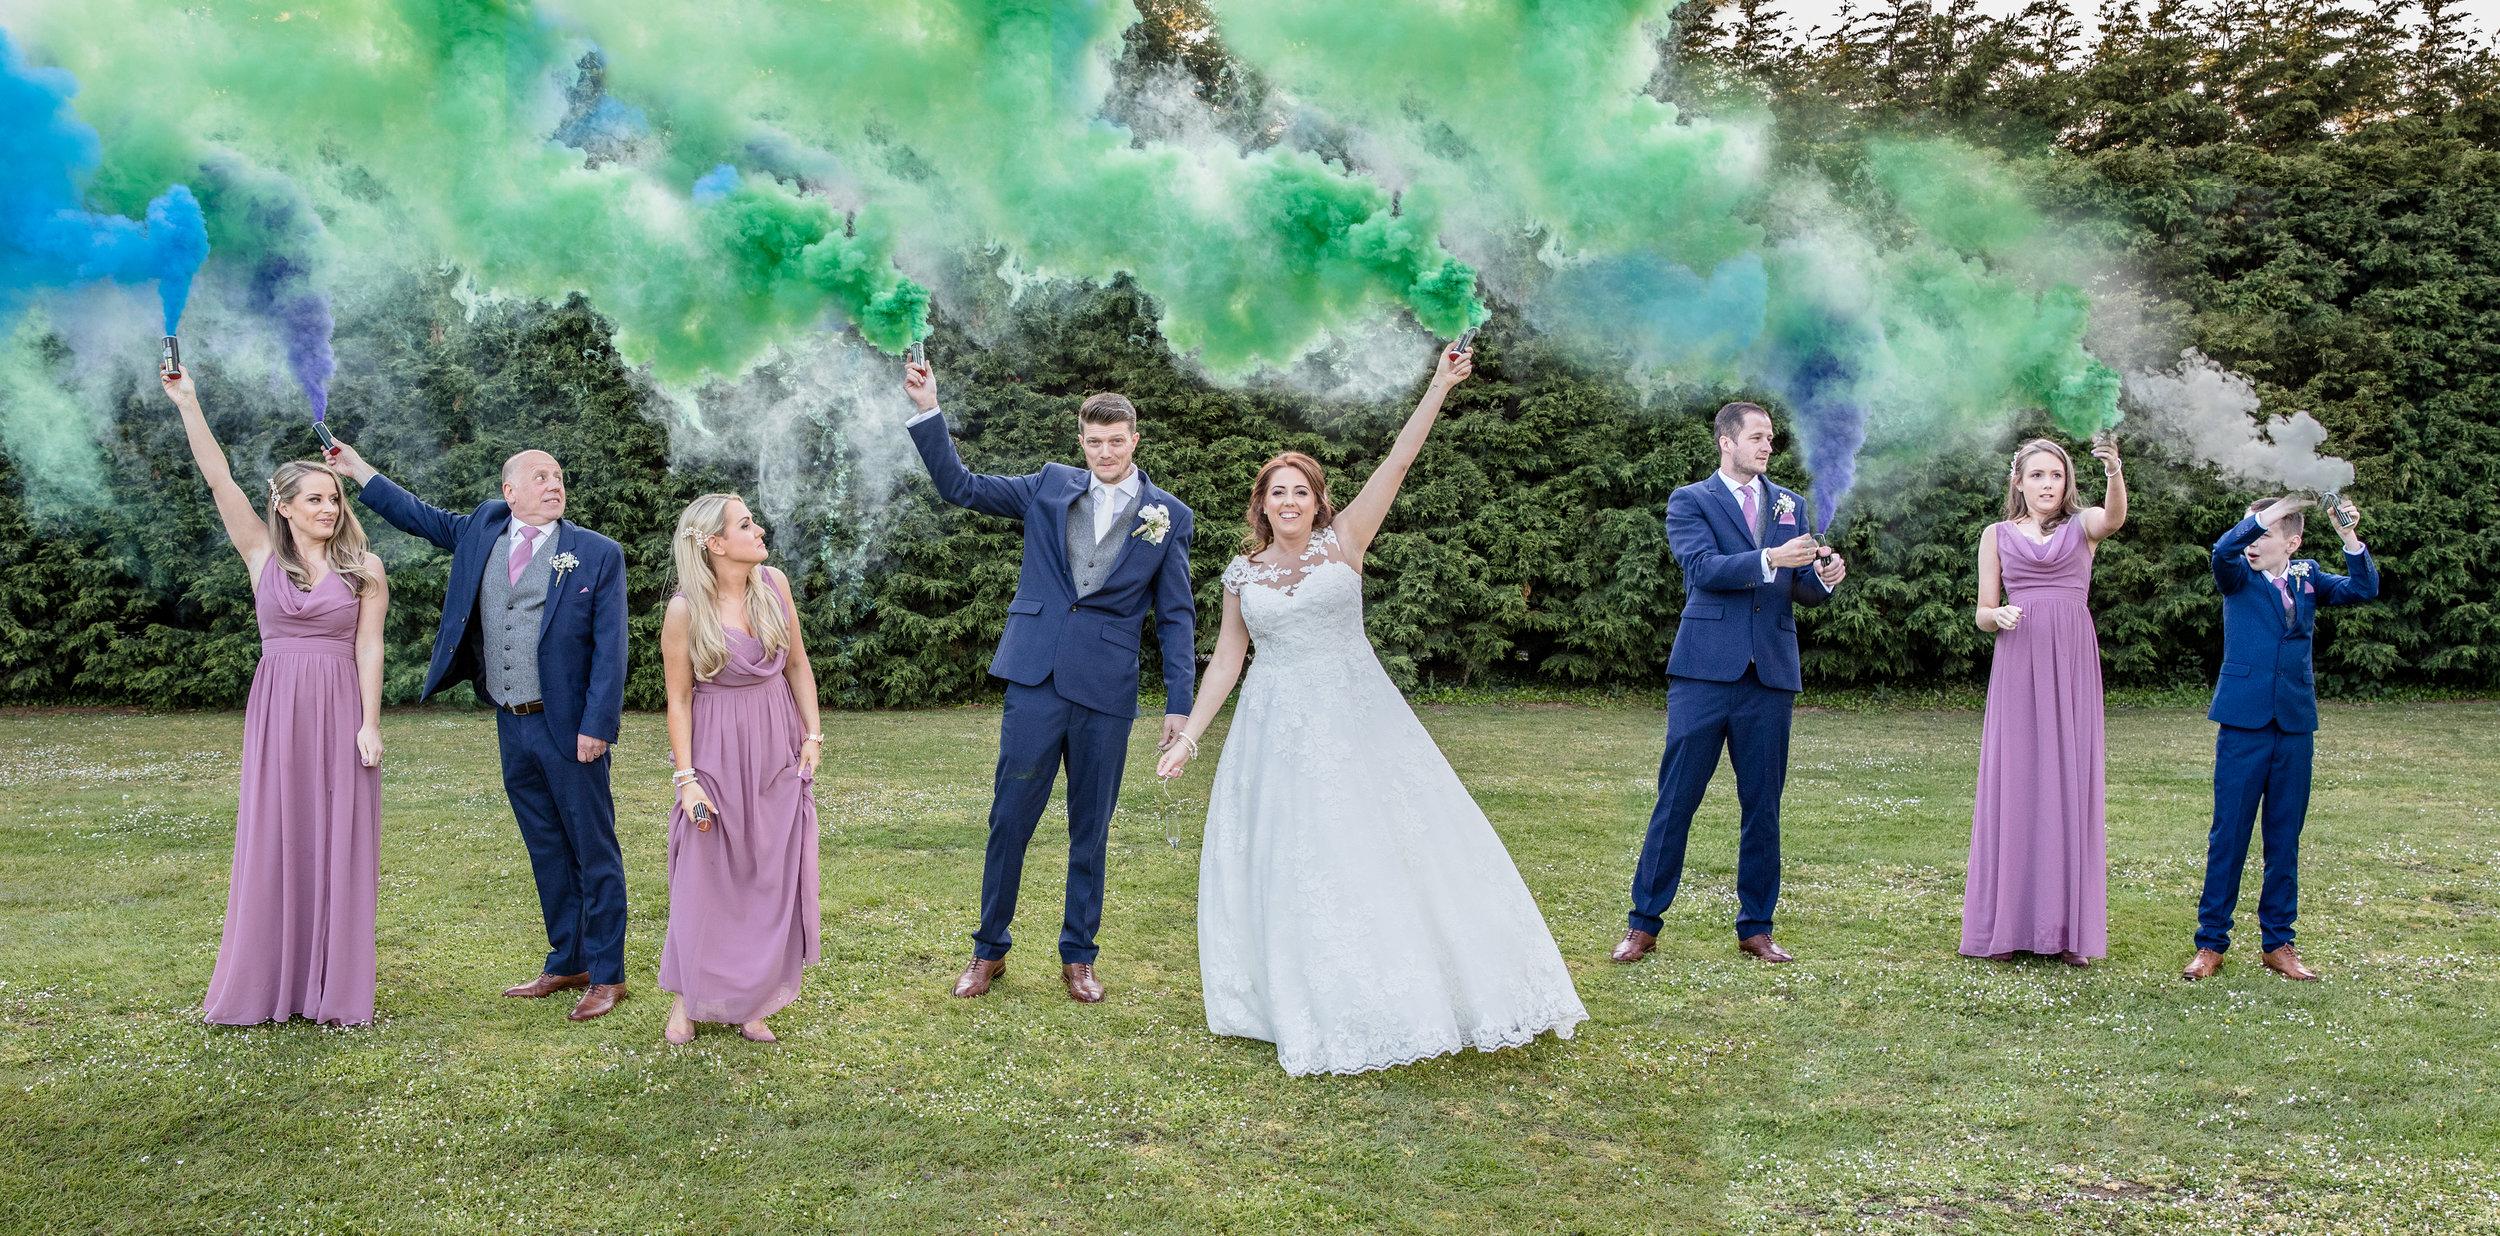 smoke-bomb-wedding.jpg